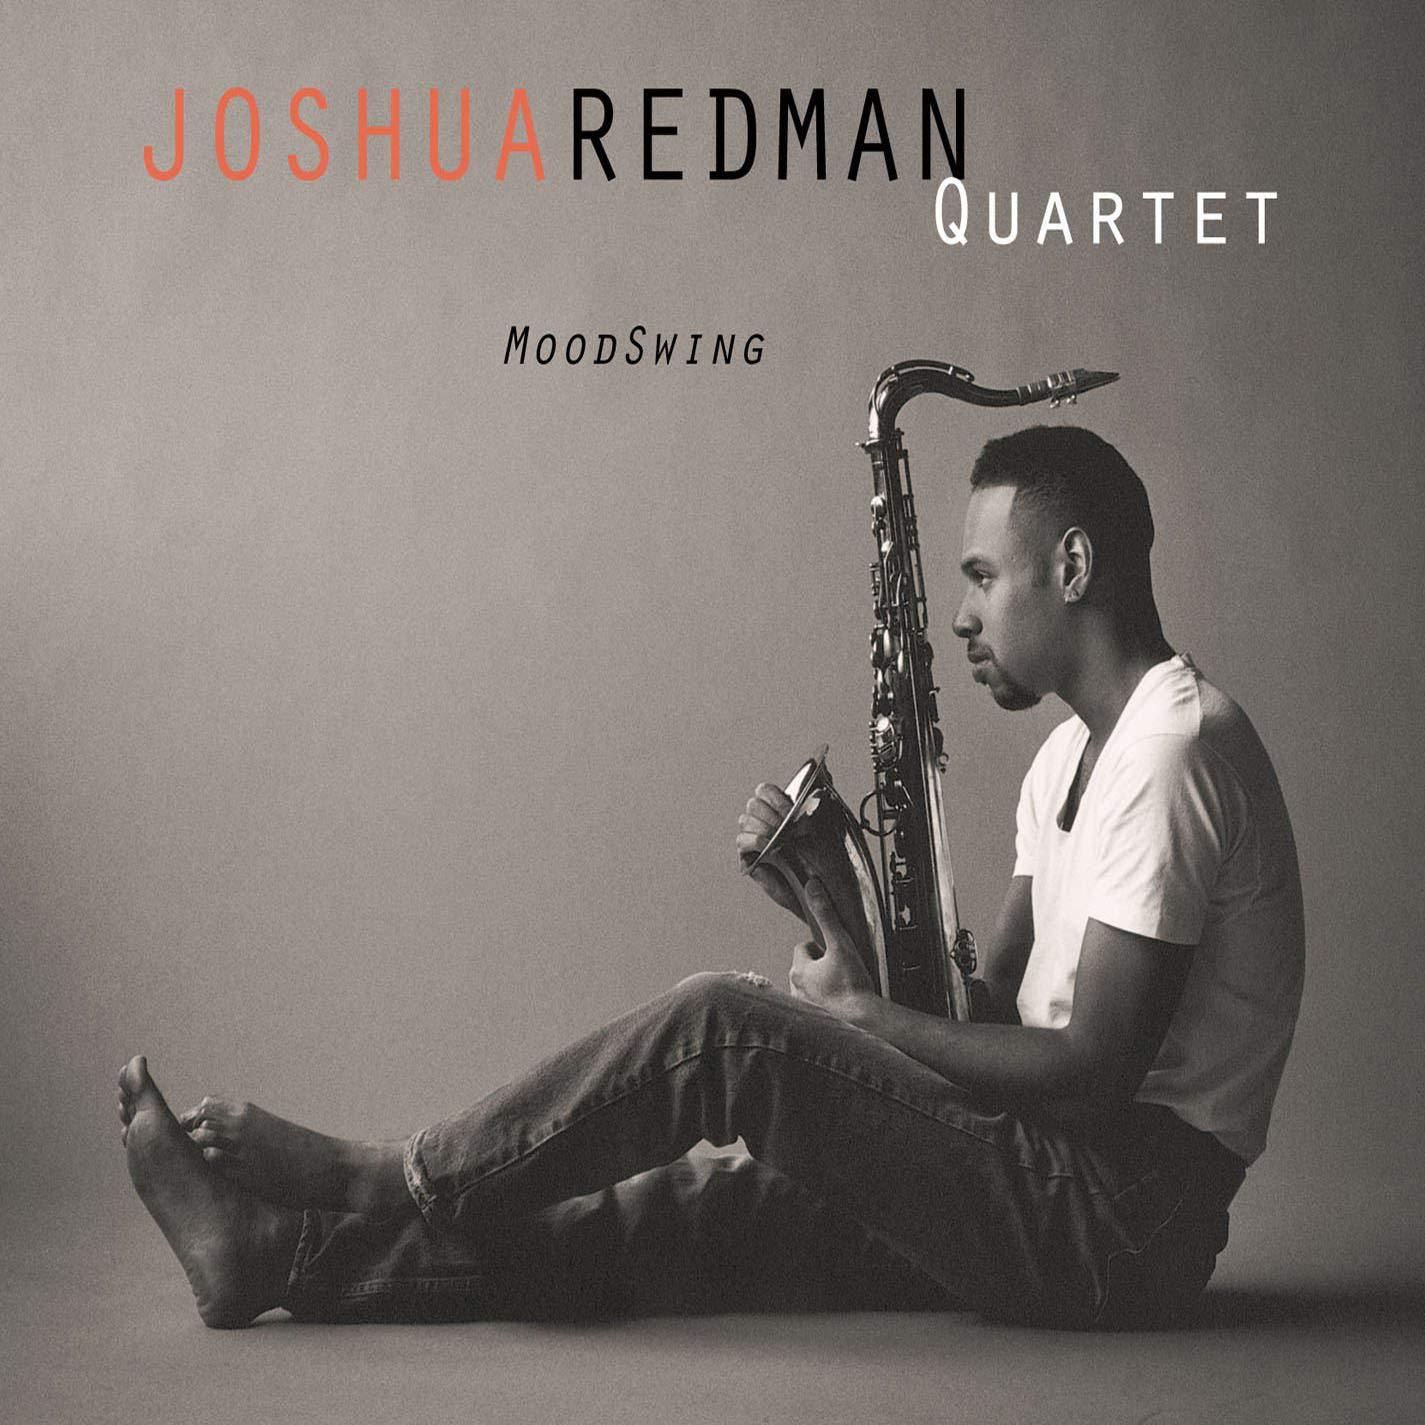 Joshua Redman Quartet - MoodSwing (1994) [FLAC] Download